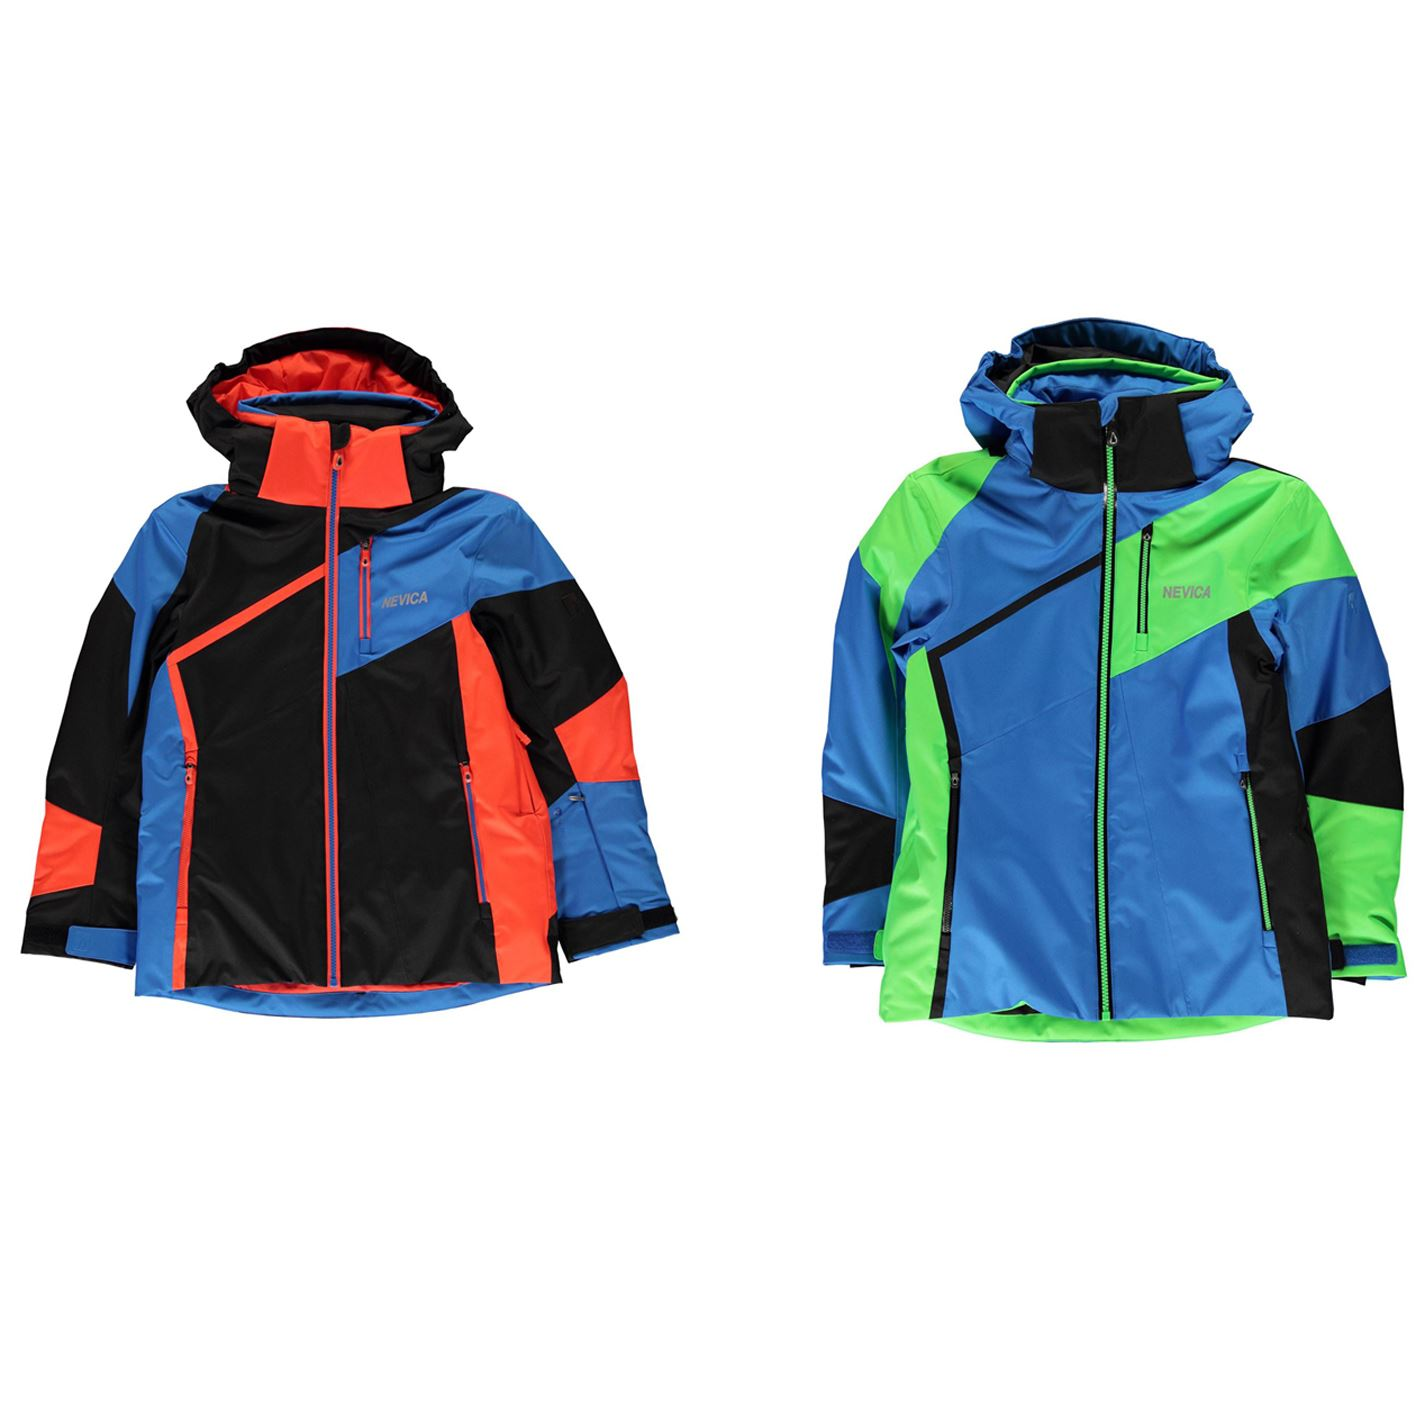 ... Nevica Vail Ski Jacket Junior Boys Snow Coat Skiing Outerwear ... 388086f2135